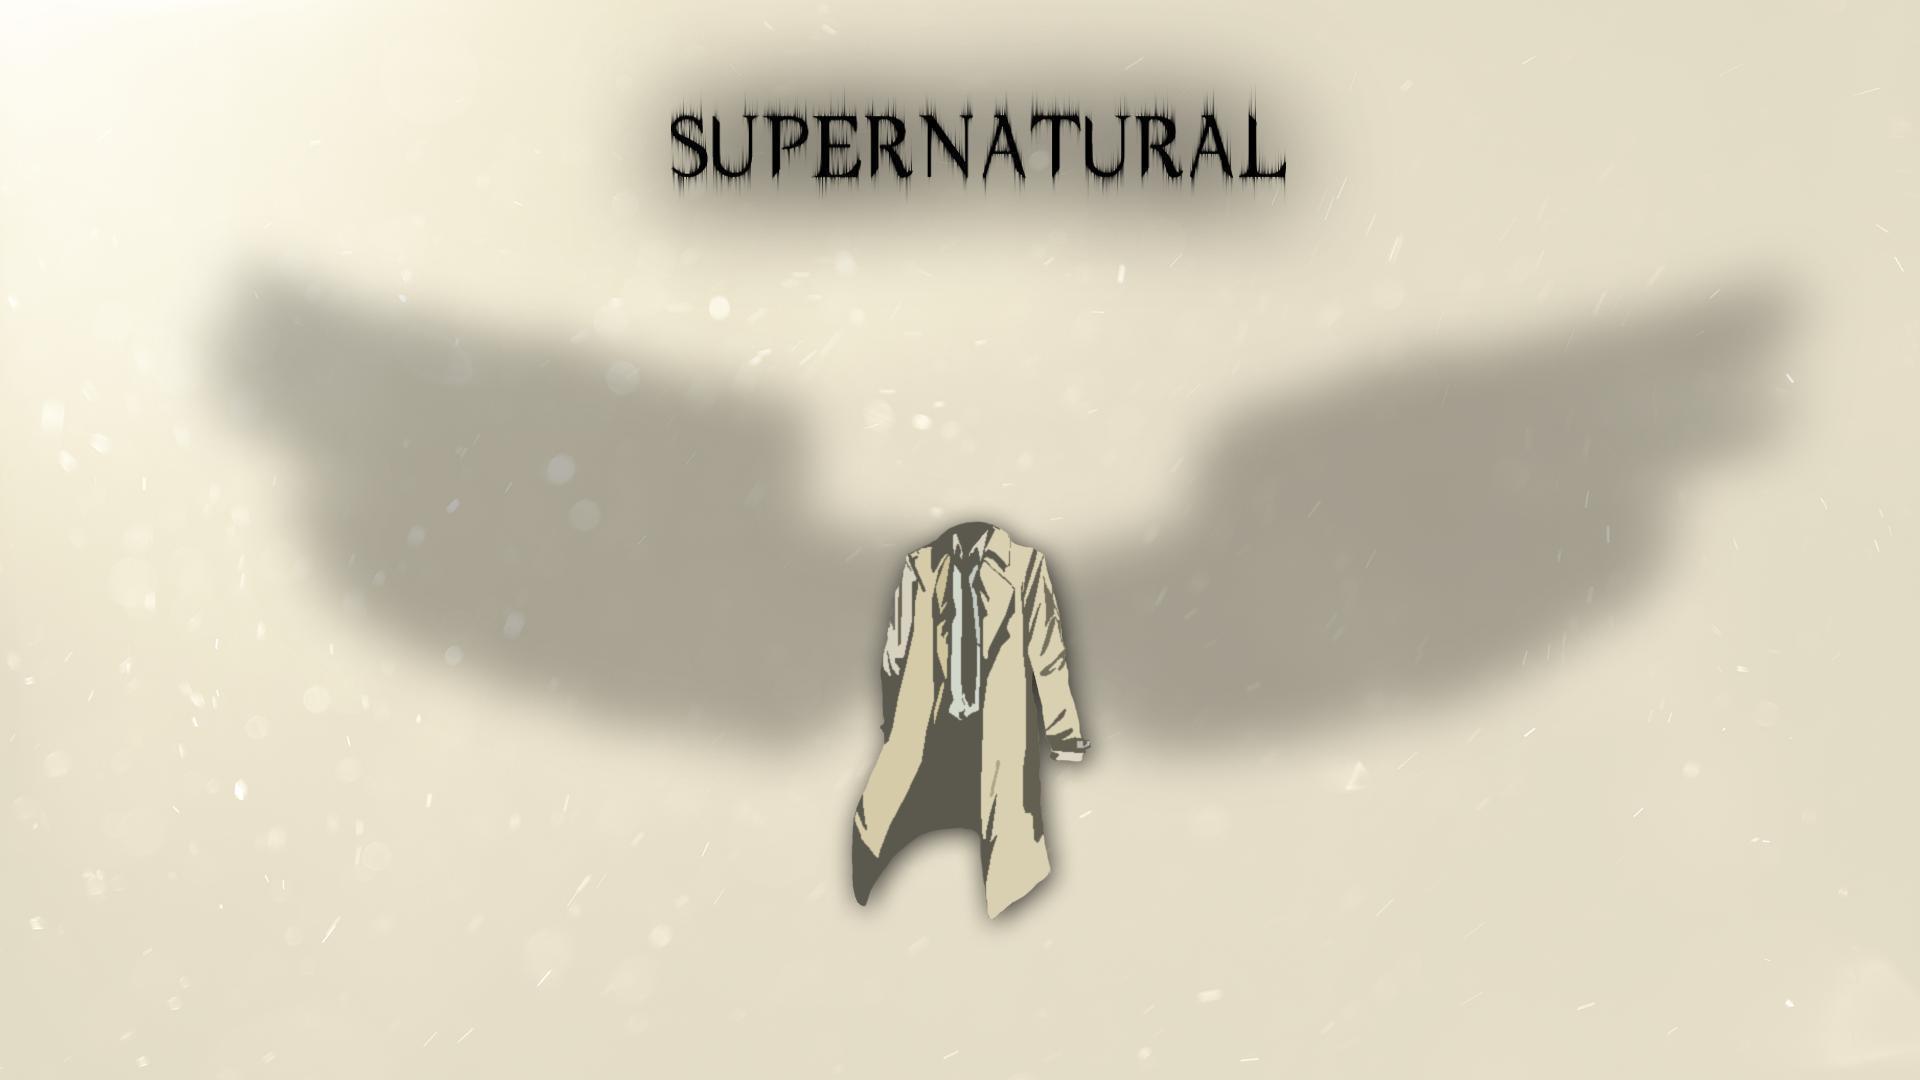 supernatural impala iphone wallpaper